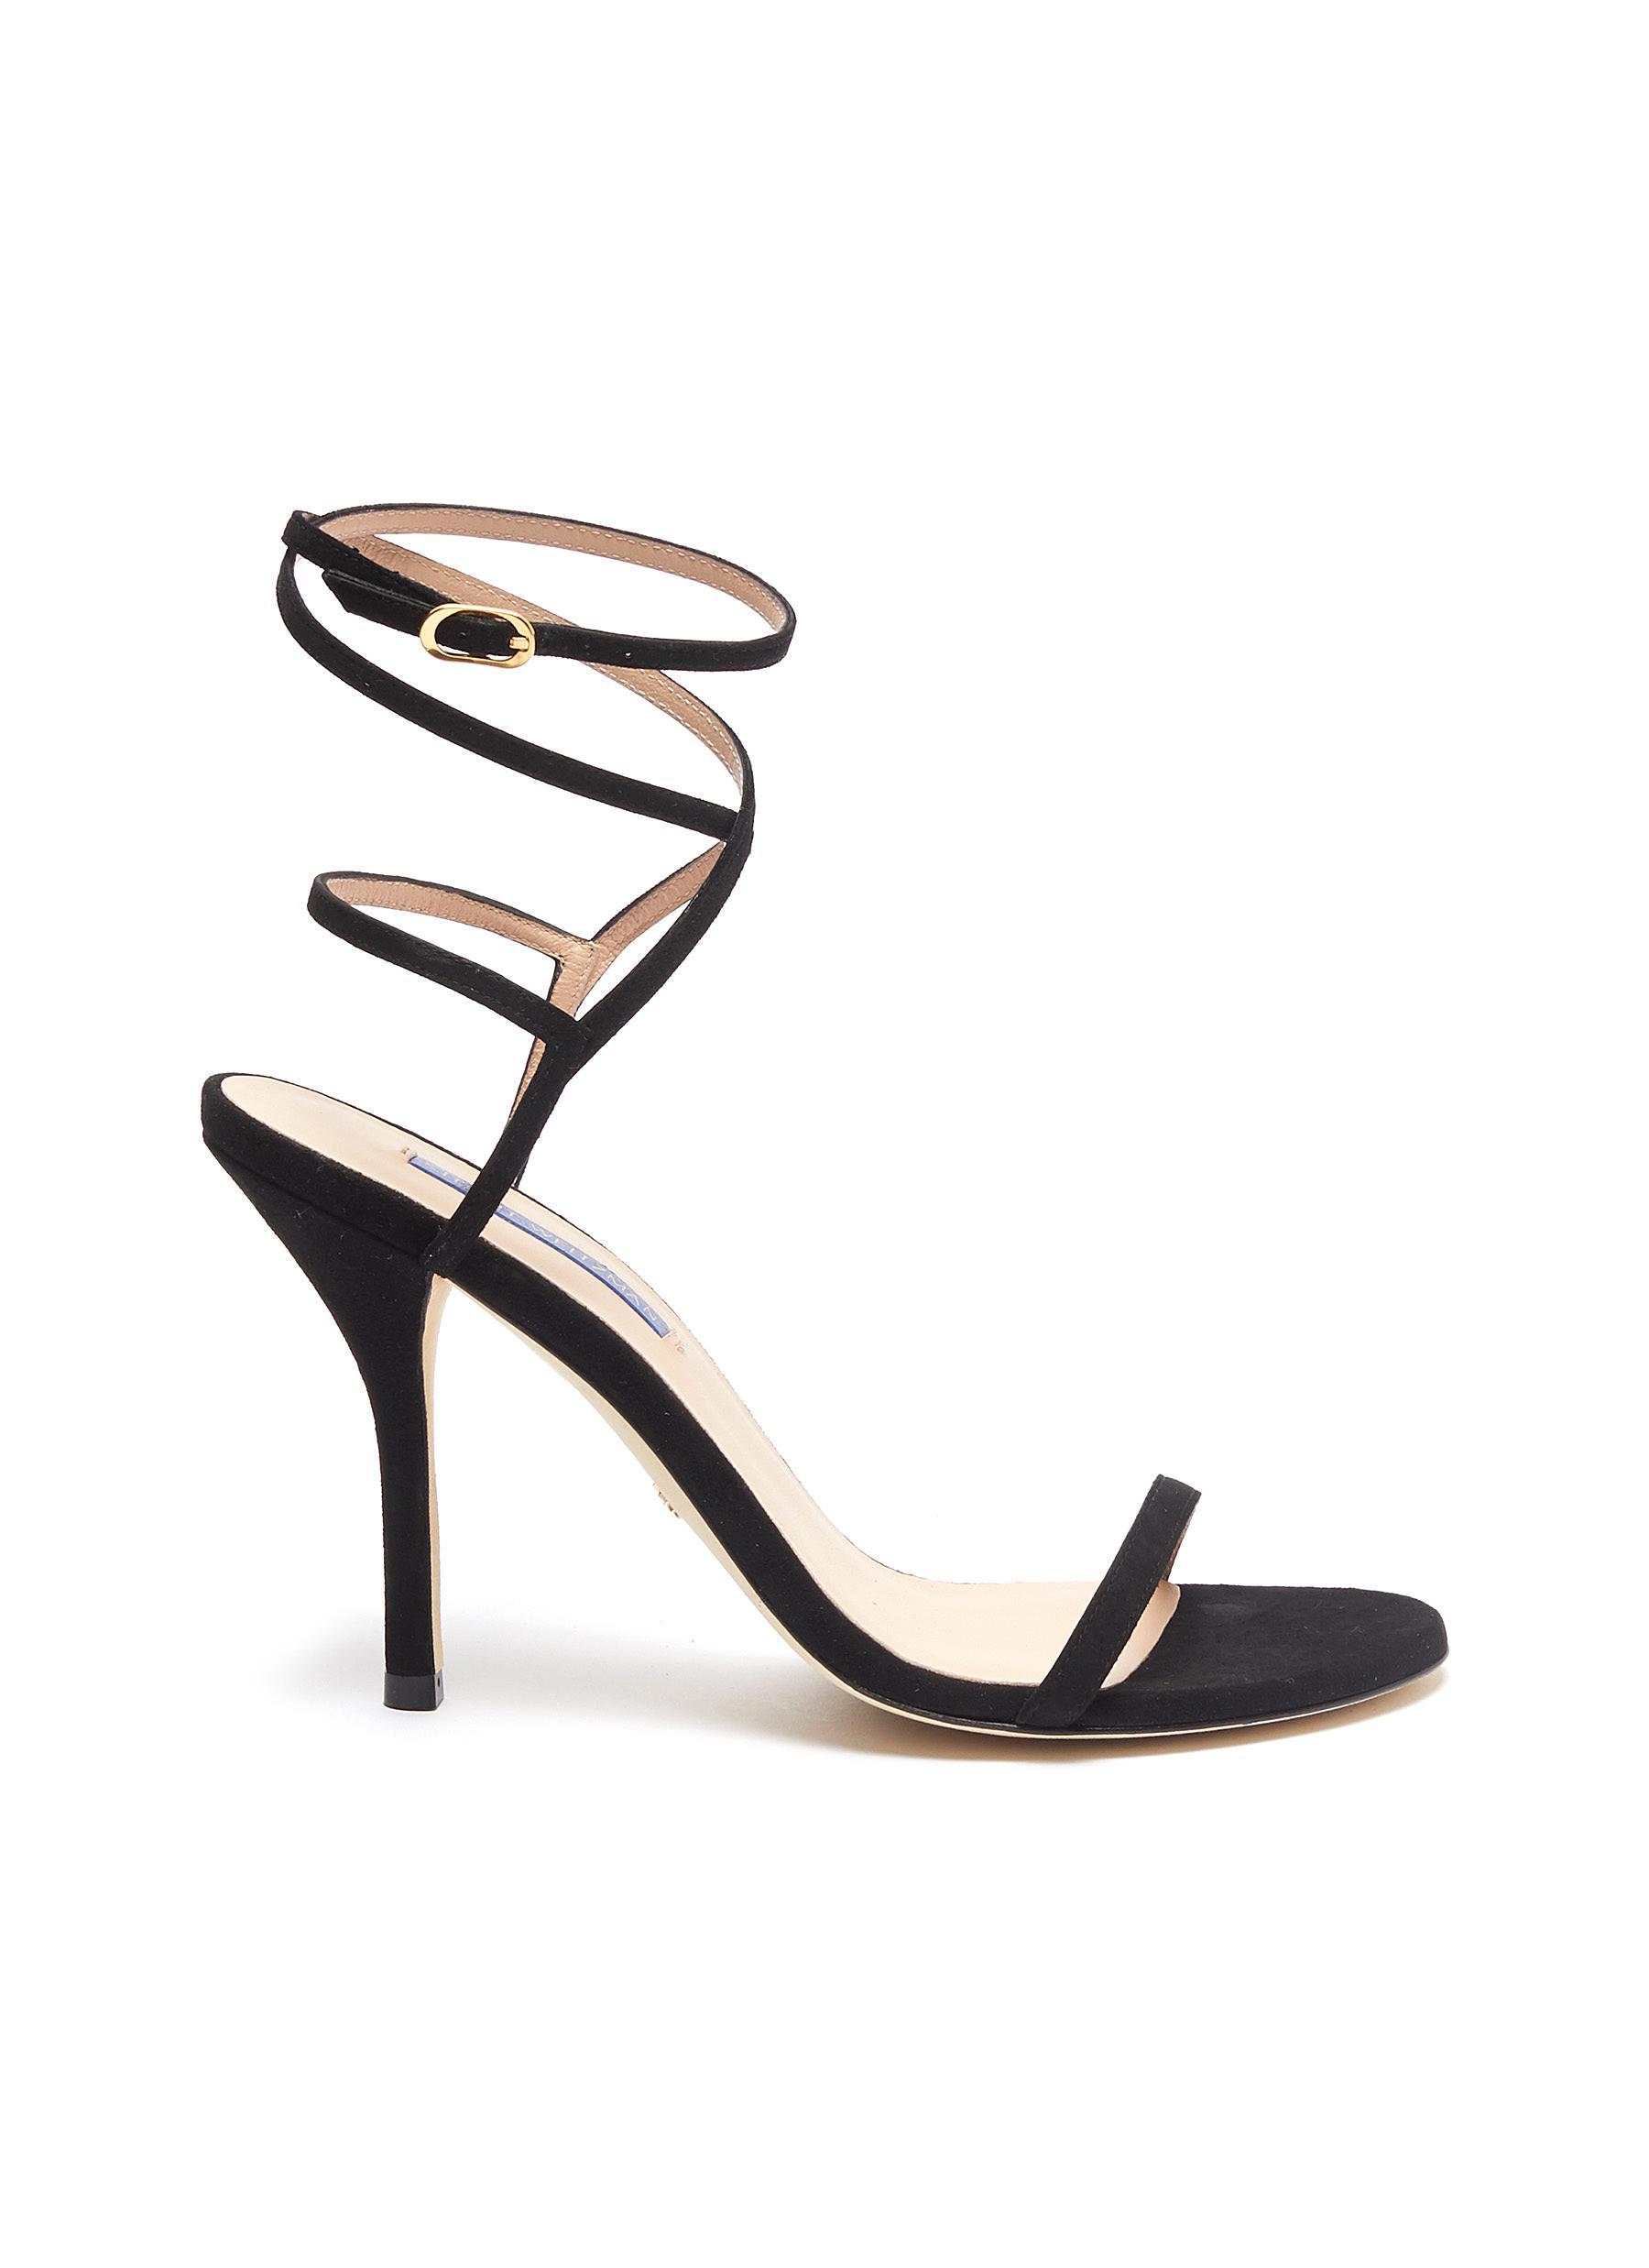 Merinda crisscross ankle strap suede sandals by Stuart Weitzman